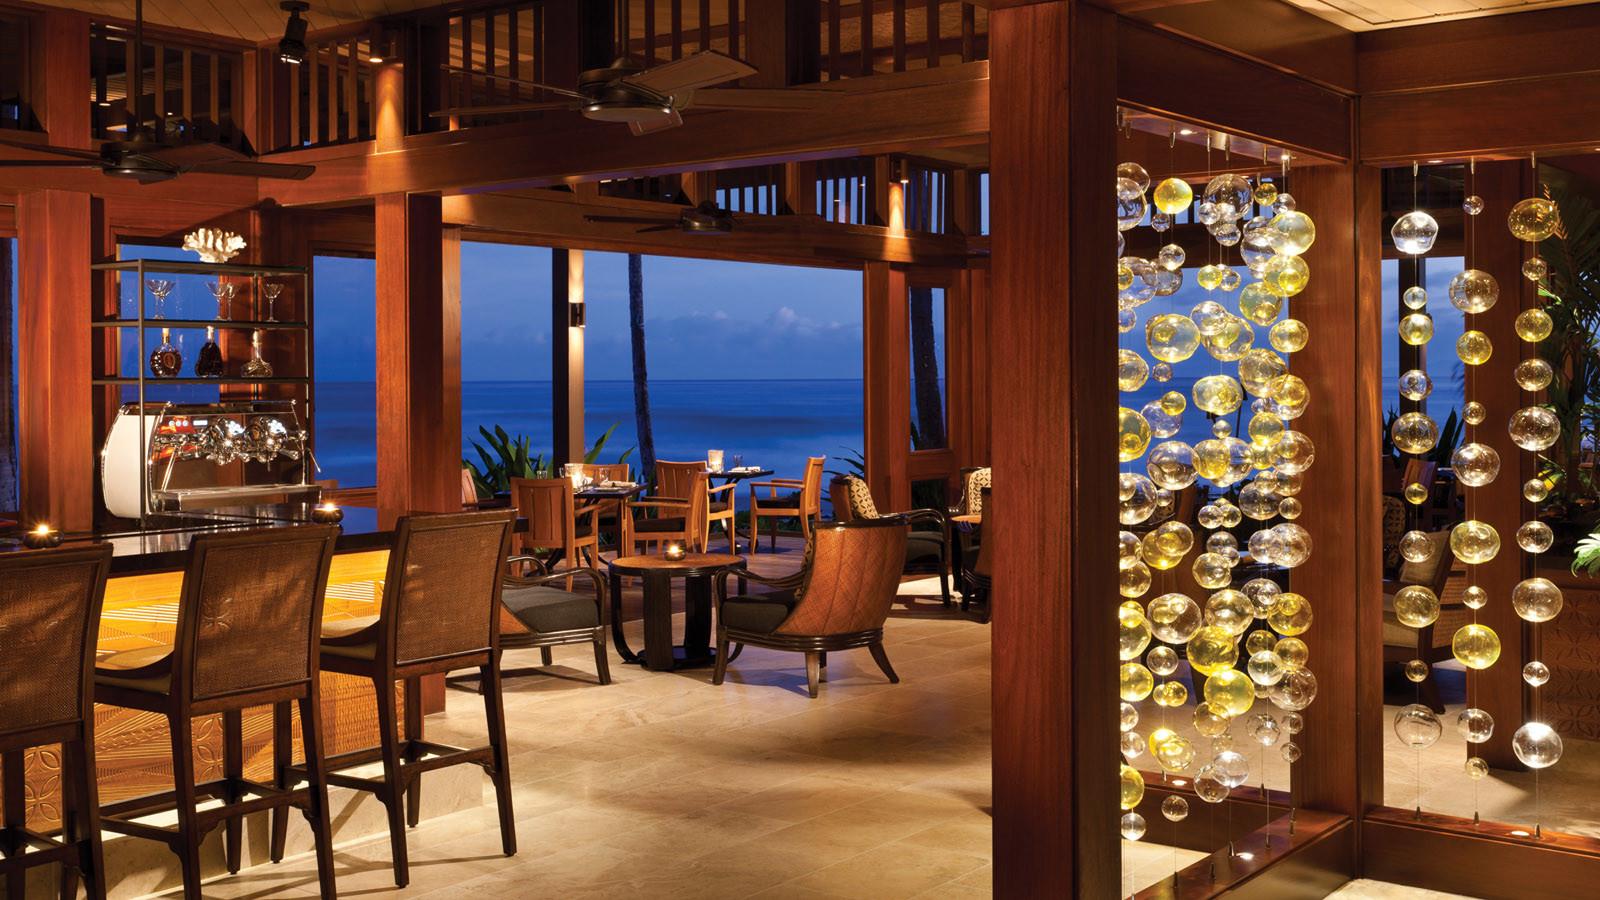 news-main-four-seasons-resort-hualalai-announces-chef-in-residence-series.1615395117.jpg